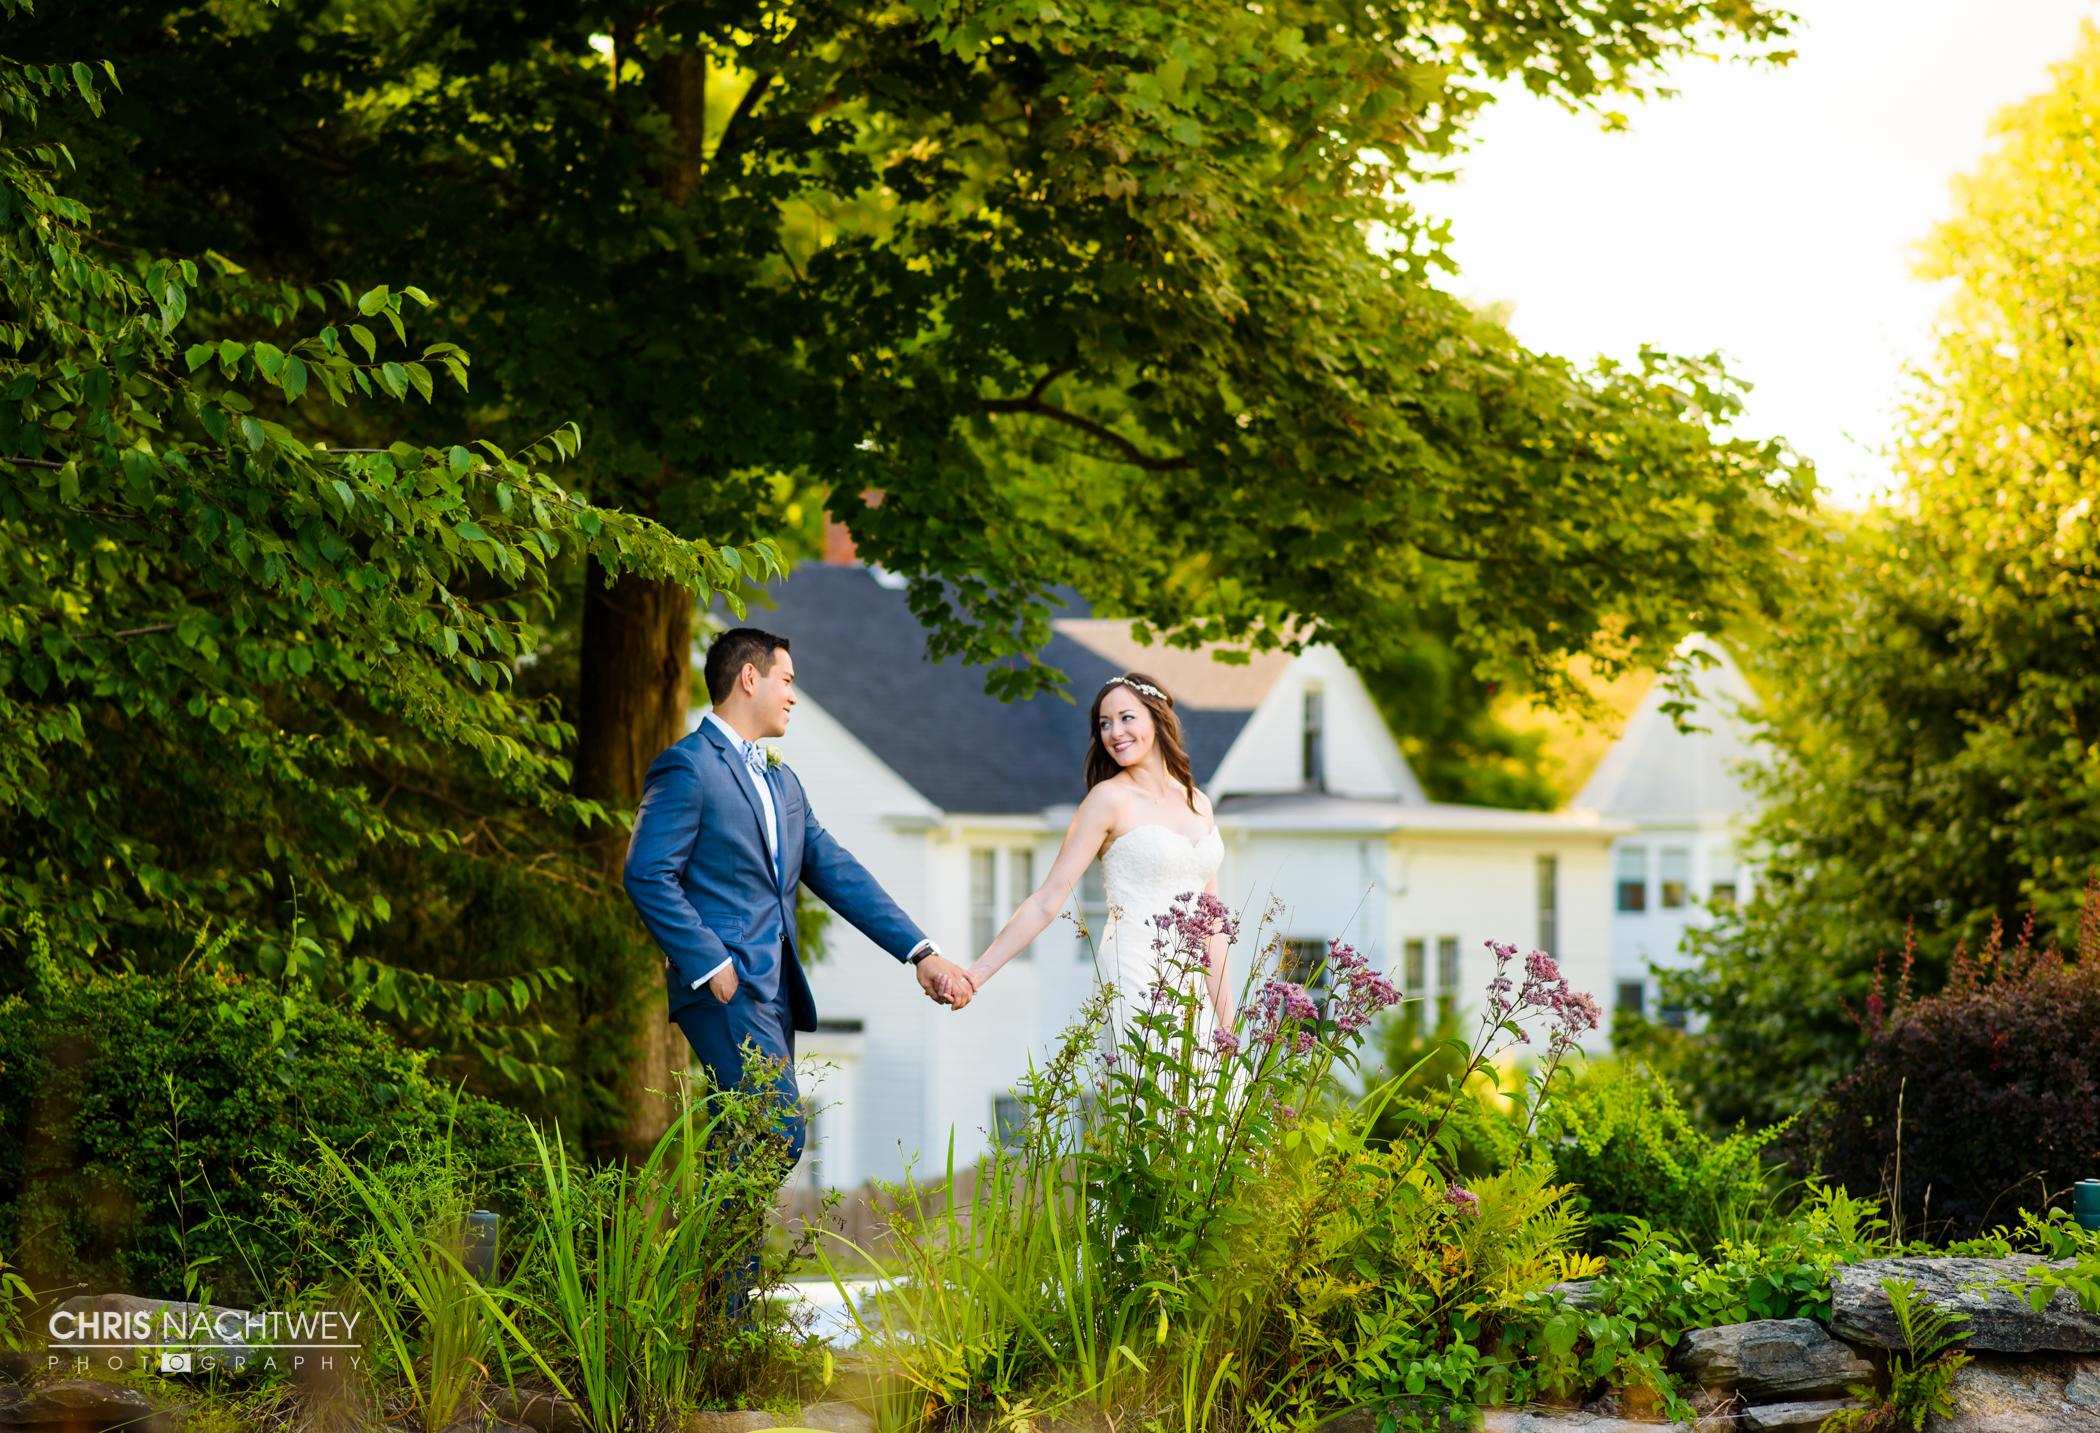 inn-at-mystic-connecticut-wedding-photographer-chris-nachtwey-24.jpg